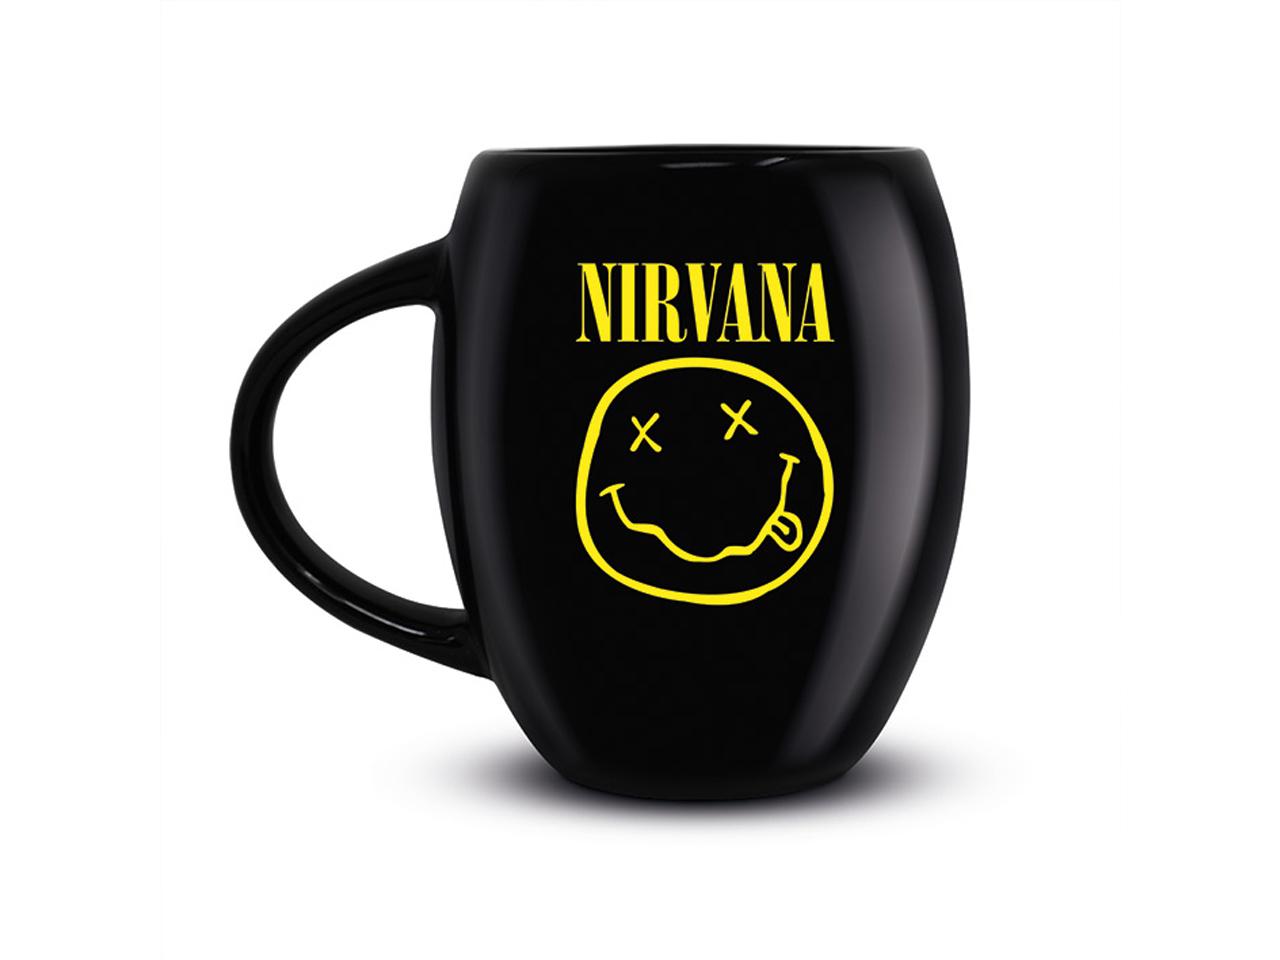 Nirvana Black Oval Mug Official Band Merch Smiley Logo Iconic Music Rock Classic Retro Nostalgia